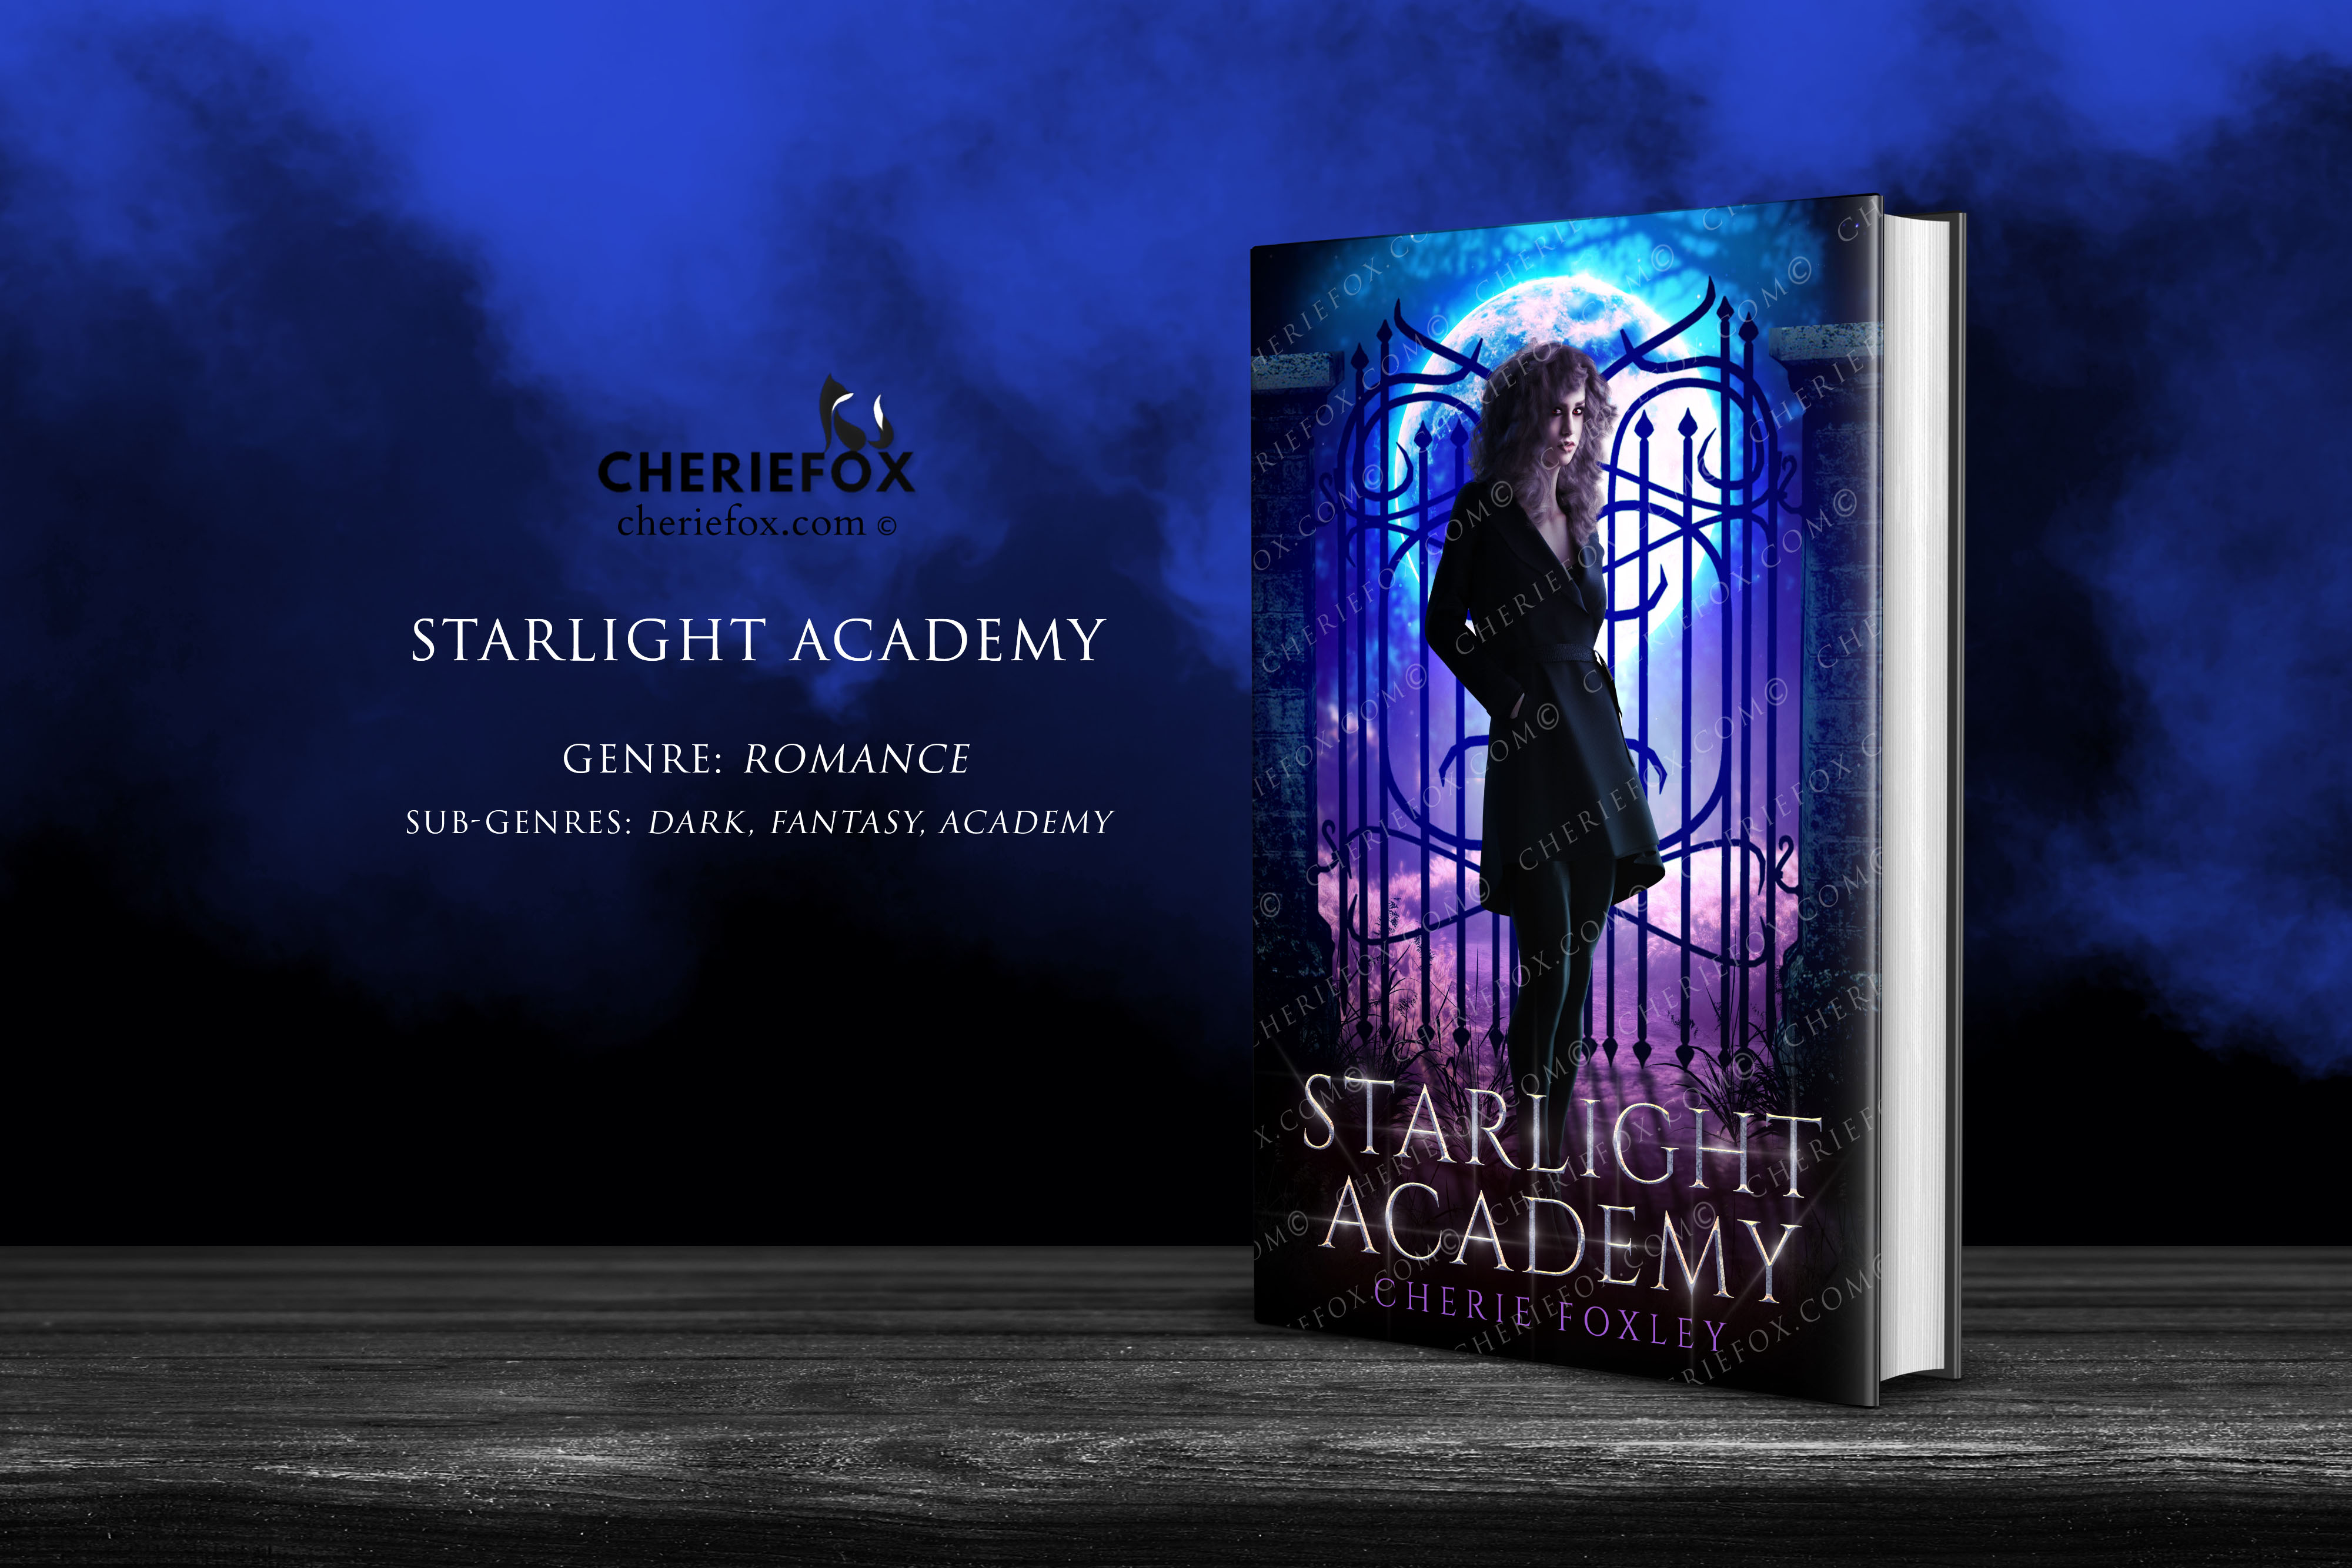 Starlight Academy cheriefox-com-image